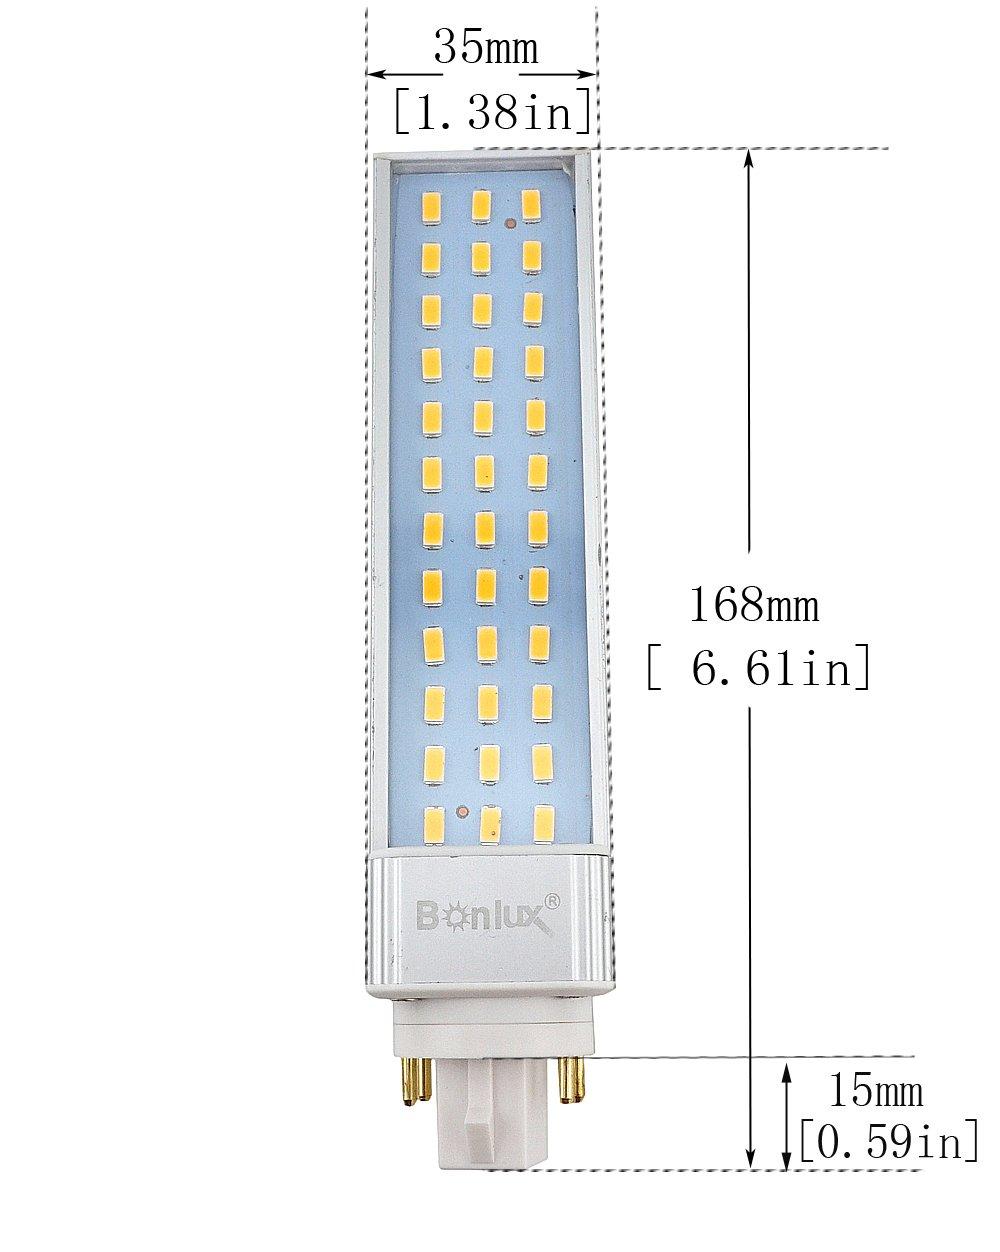 Bonlux 2 Pack Led Gx24q 4 Pin Rotatable Pl Lamp 26w Gx24 Cfl Wiring Diagram Replacement 180 Degree Beam Angle Daylight 6000k C Horizontal Recessed G24q Bulb